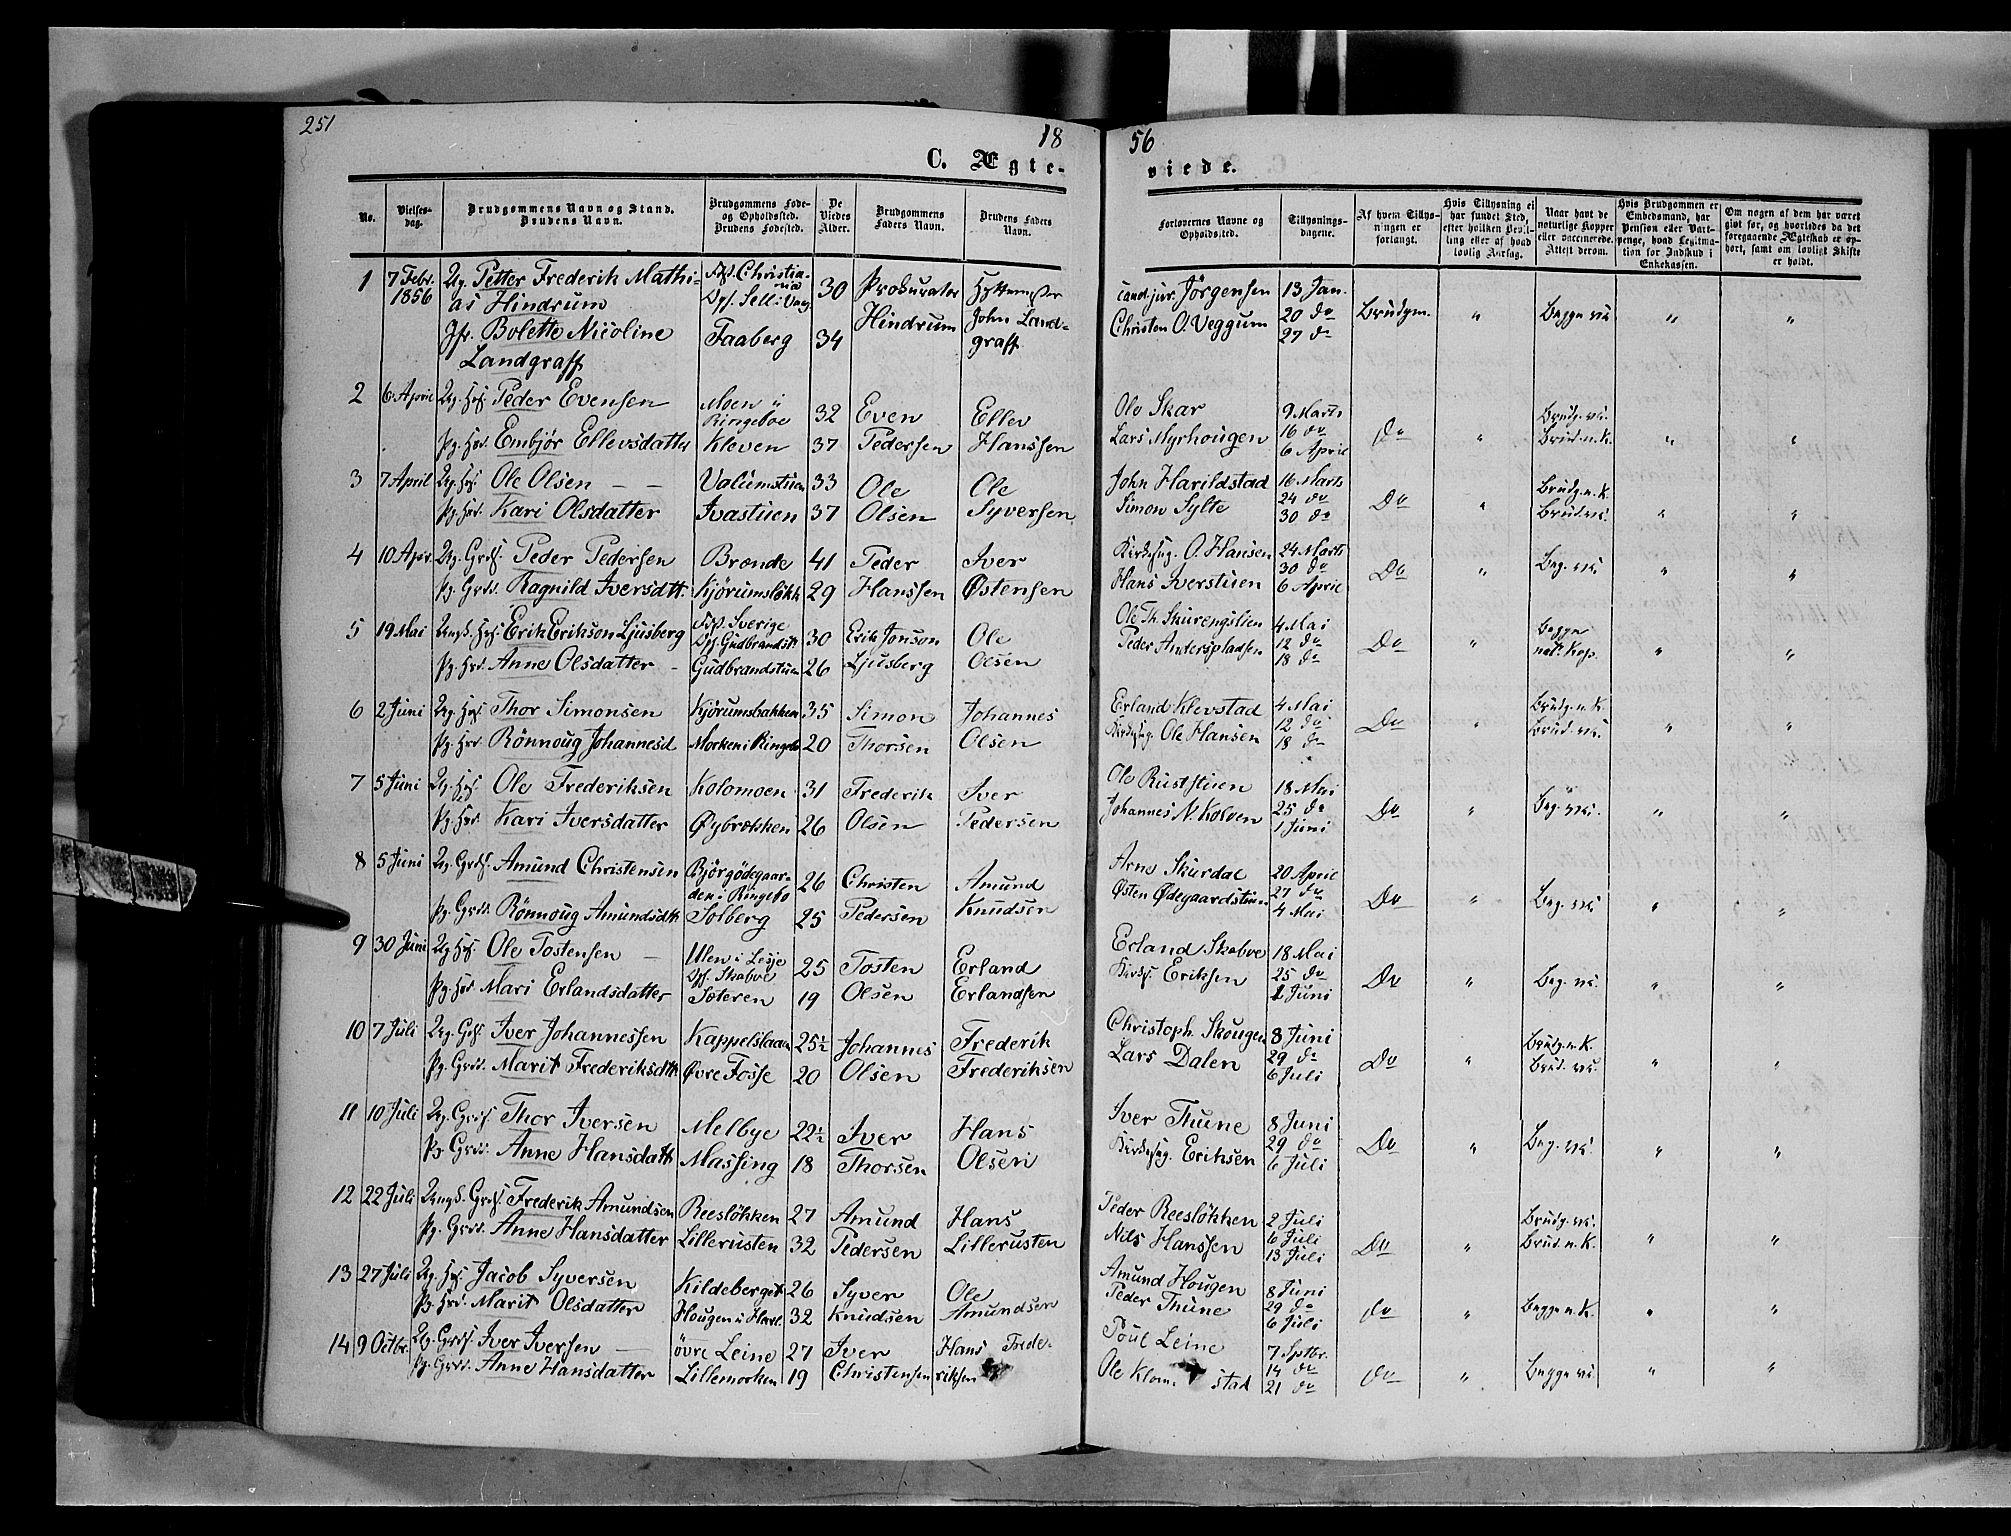 SAH, Nord-Fron prestekontor, Ministerialbok nr. 1, 1851-1864, s. 251